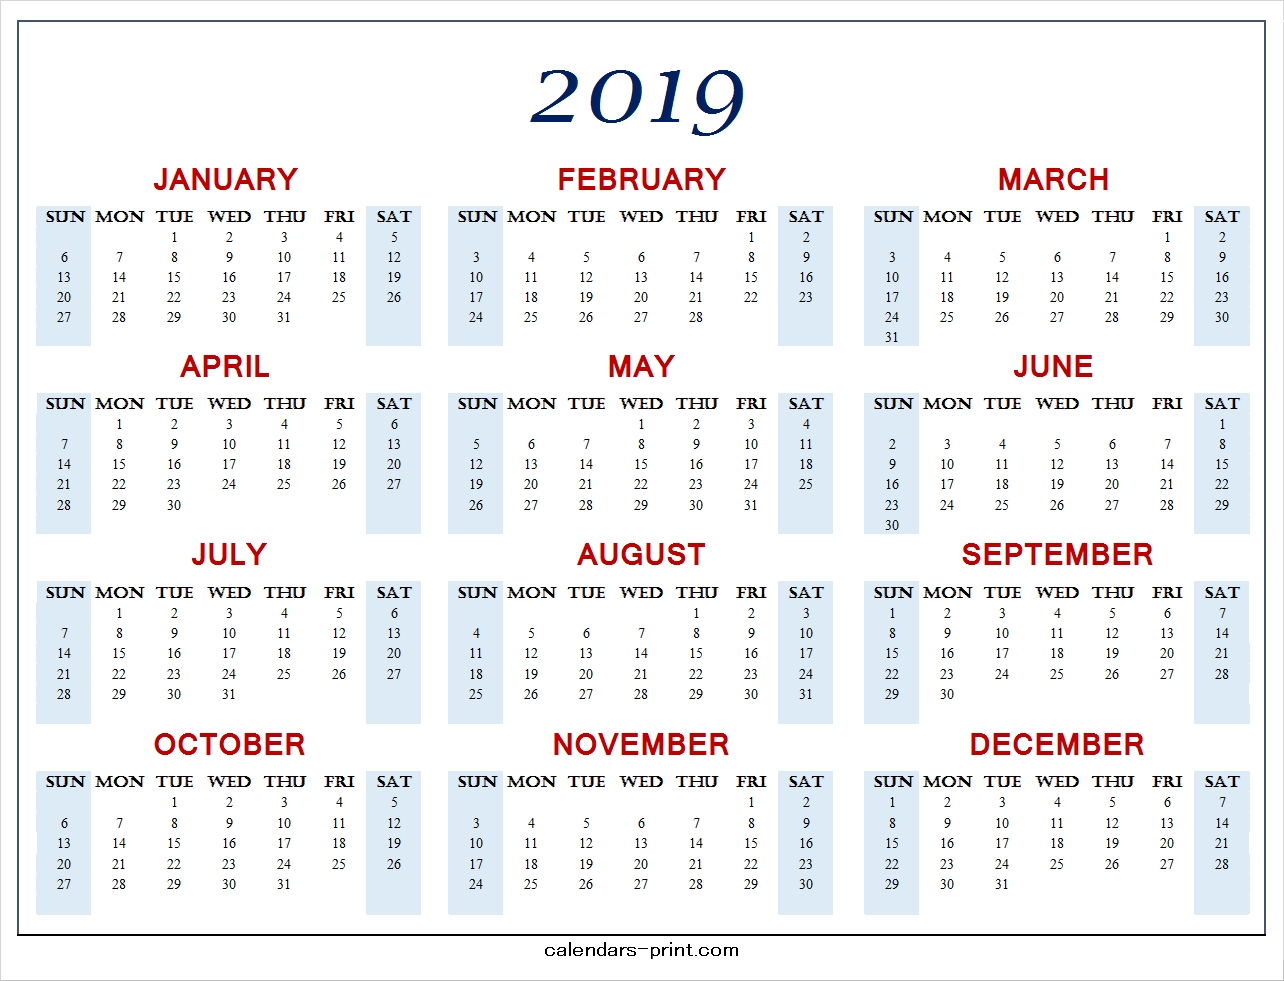 Calendar 2019 Template To Print Free | Download Blank Pdf Template 2019 Calendar You Can Edit